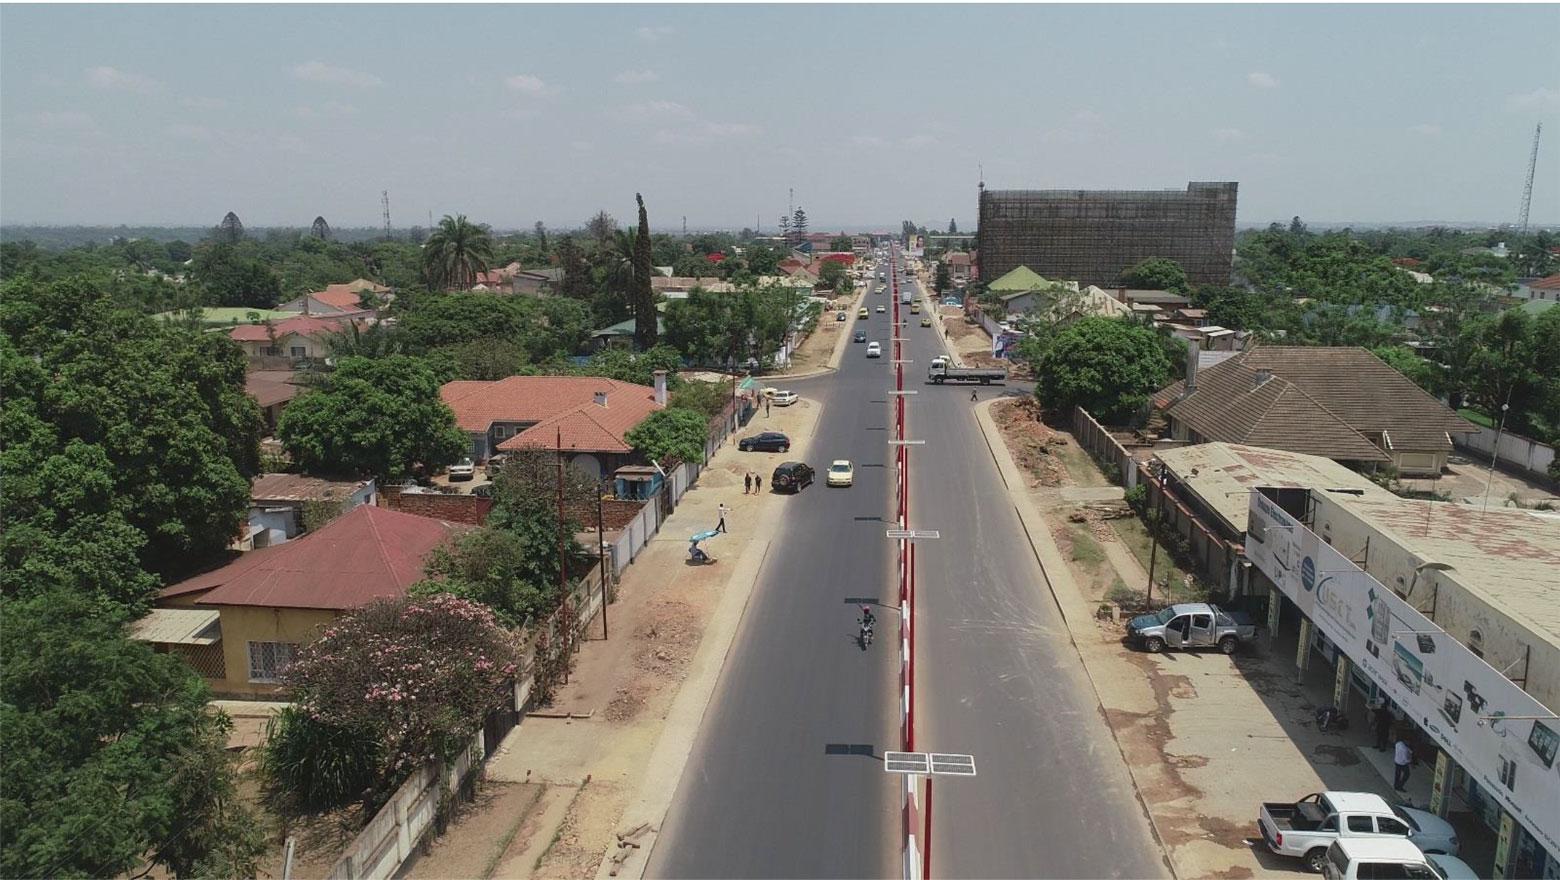 Kasavubu avenue in Lubumbashi